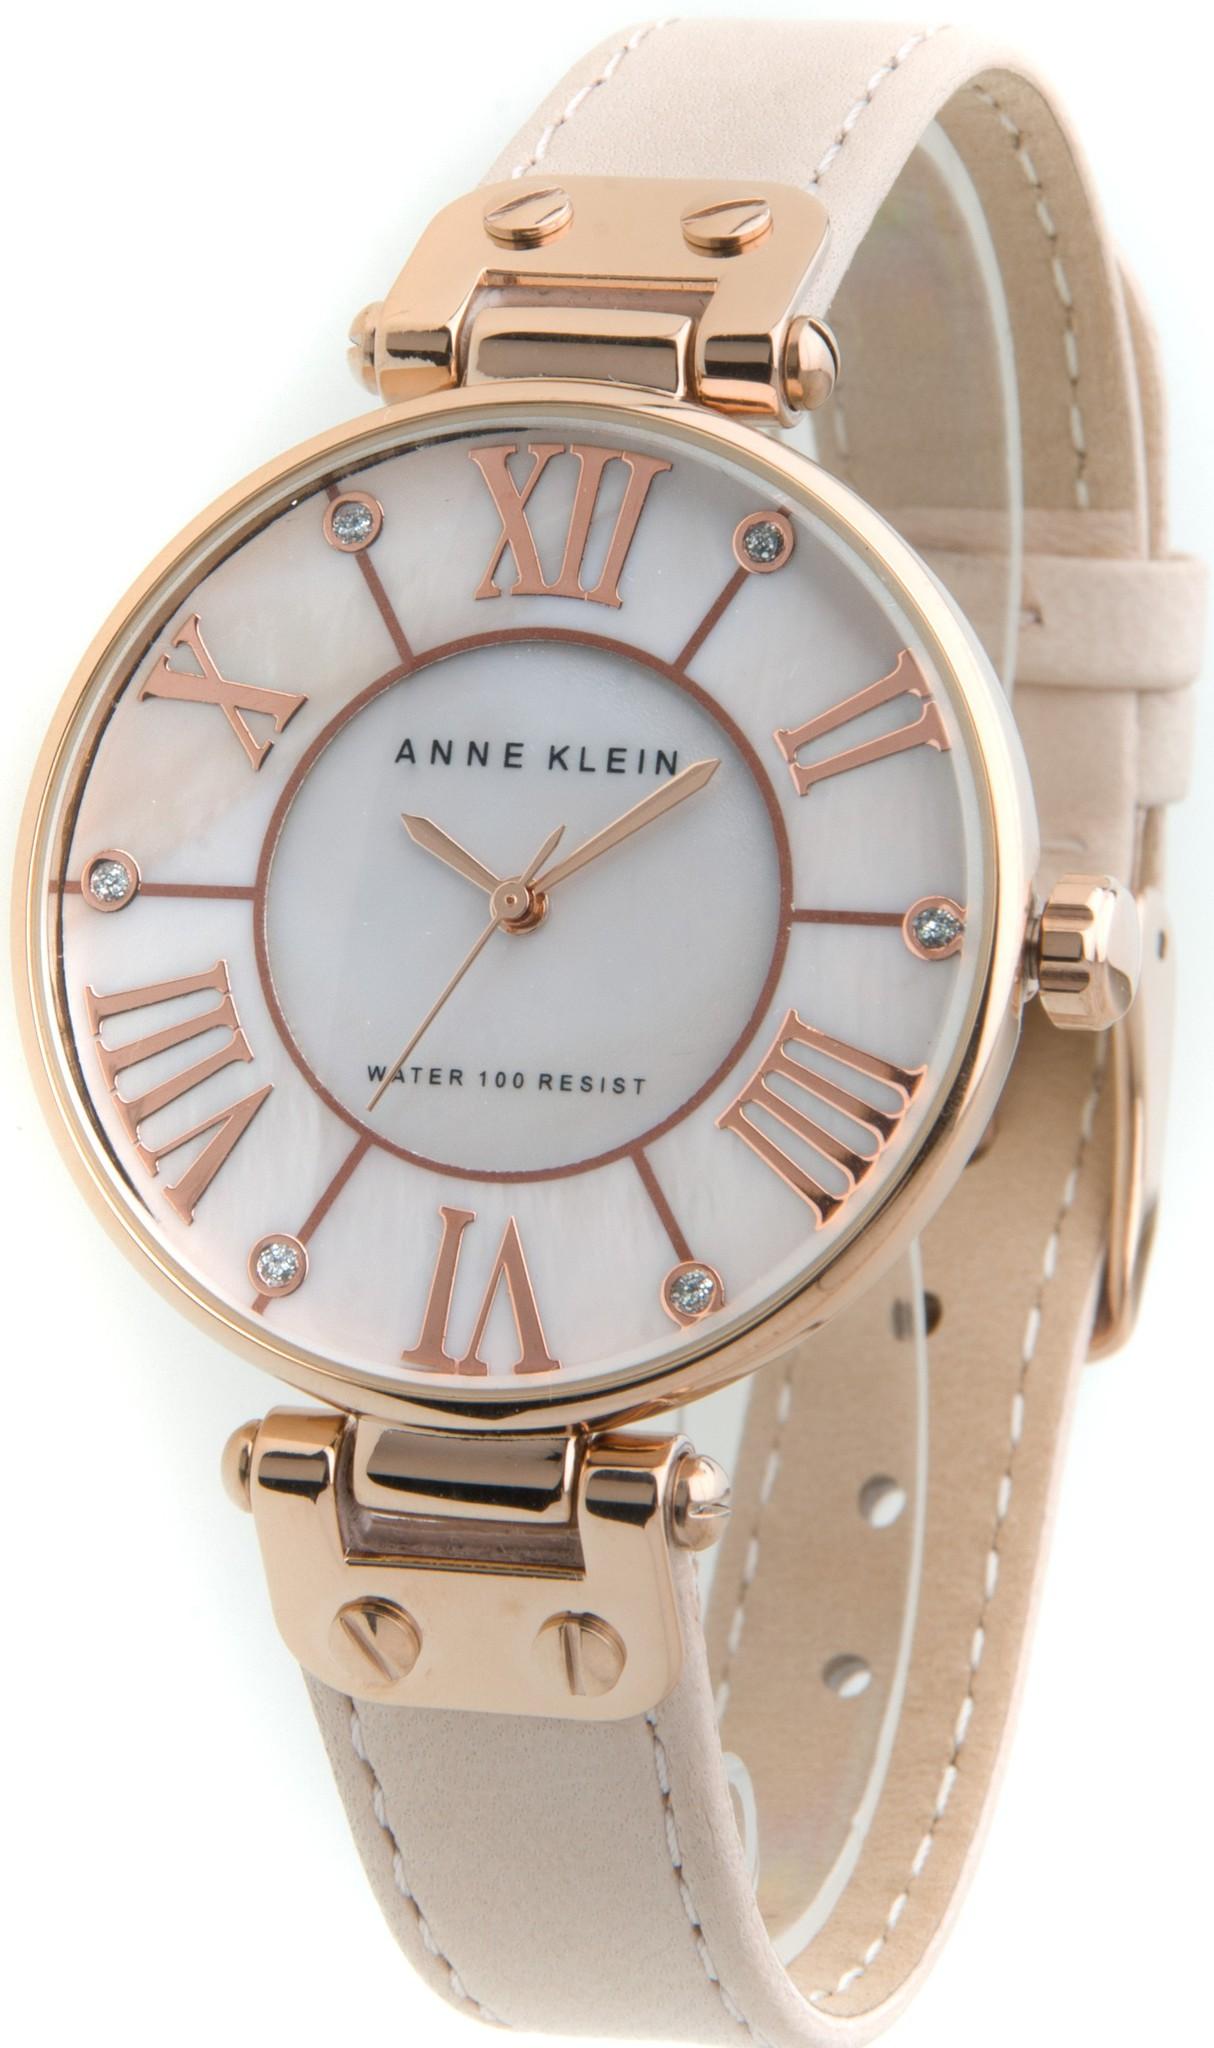 Anne Klein 9918RGLP - женские наручные часы из коллекции RingAnne Klein<br><br><br>Бренд: Anne Klein<br>Модель: Anne Klein 9918 RGLP<br>Артикул: 9918RGLP<br>Вариант артикула: None<br>Коллекция: Ring<br>Подколлекция: None<br>Страна: США<br>Пол: женские<br>Тип механизма: кварцевые<br>Механизм: None<br>Количество камней: None<br>Автоподзавод: None<br>Источник энергии: от батарейки<br>Срок службы элемента питания: None<br>Дисплей: стрелки<br>Цифры: римские<br>Водозащита: WR 30<br>Противоударные: None<br>Материал корпуса: не указан, PVD покрытие: позолота (полное)<br>Материал браслета: кожа<br>Материал безеля: None<br>Стекло: минеральное<br>Антибликовое покрытие: None<br>Цвет корпуса: None<br>Цвет браслета: None<br>Цвет циферблата: None<br>Цвет безеля: None<br>Размеры: 34x9 мм<br>Диаметр: None<br>Диаметр корпуса: None<br>Толщина: None<br>Ширина ремешка: None<br>Вес: None<br>Спорт-функции: None<br>Подсветка: None<br>Вставка: None<br>Отображение даты: None<br>Хронограф: None<br>Таймер: None<br>Термометр: None<br>Хронометр: None<br>GPS: None<br>Радиосинхронизация: None<br>Барометр: None<br>Скелетон: None<br>Дополнительная информация: None<br>Дополнительные функции: None